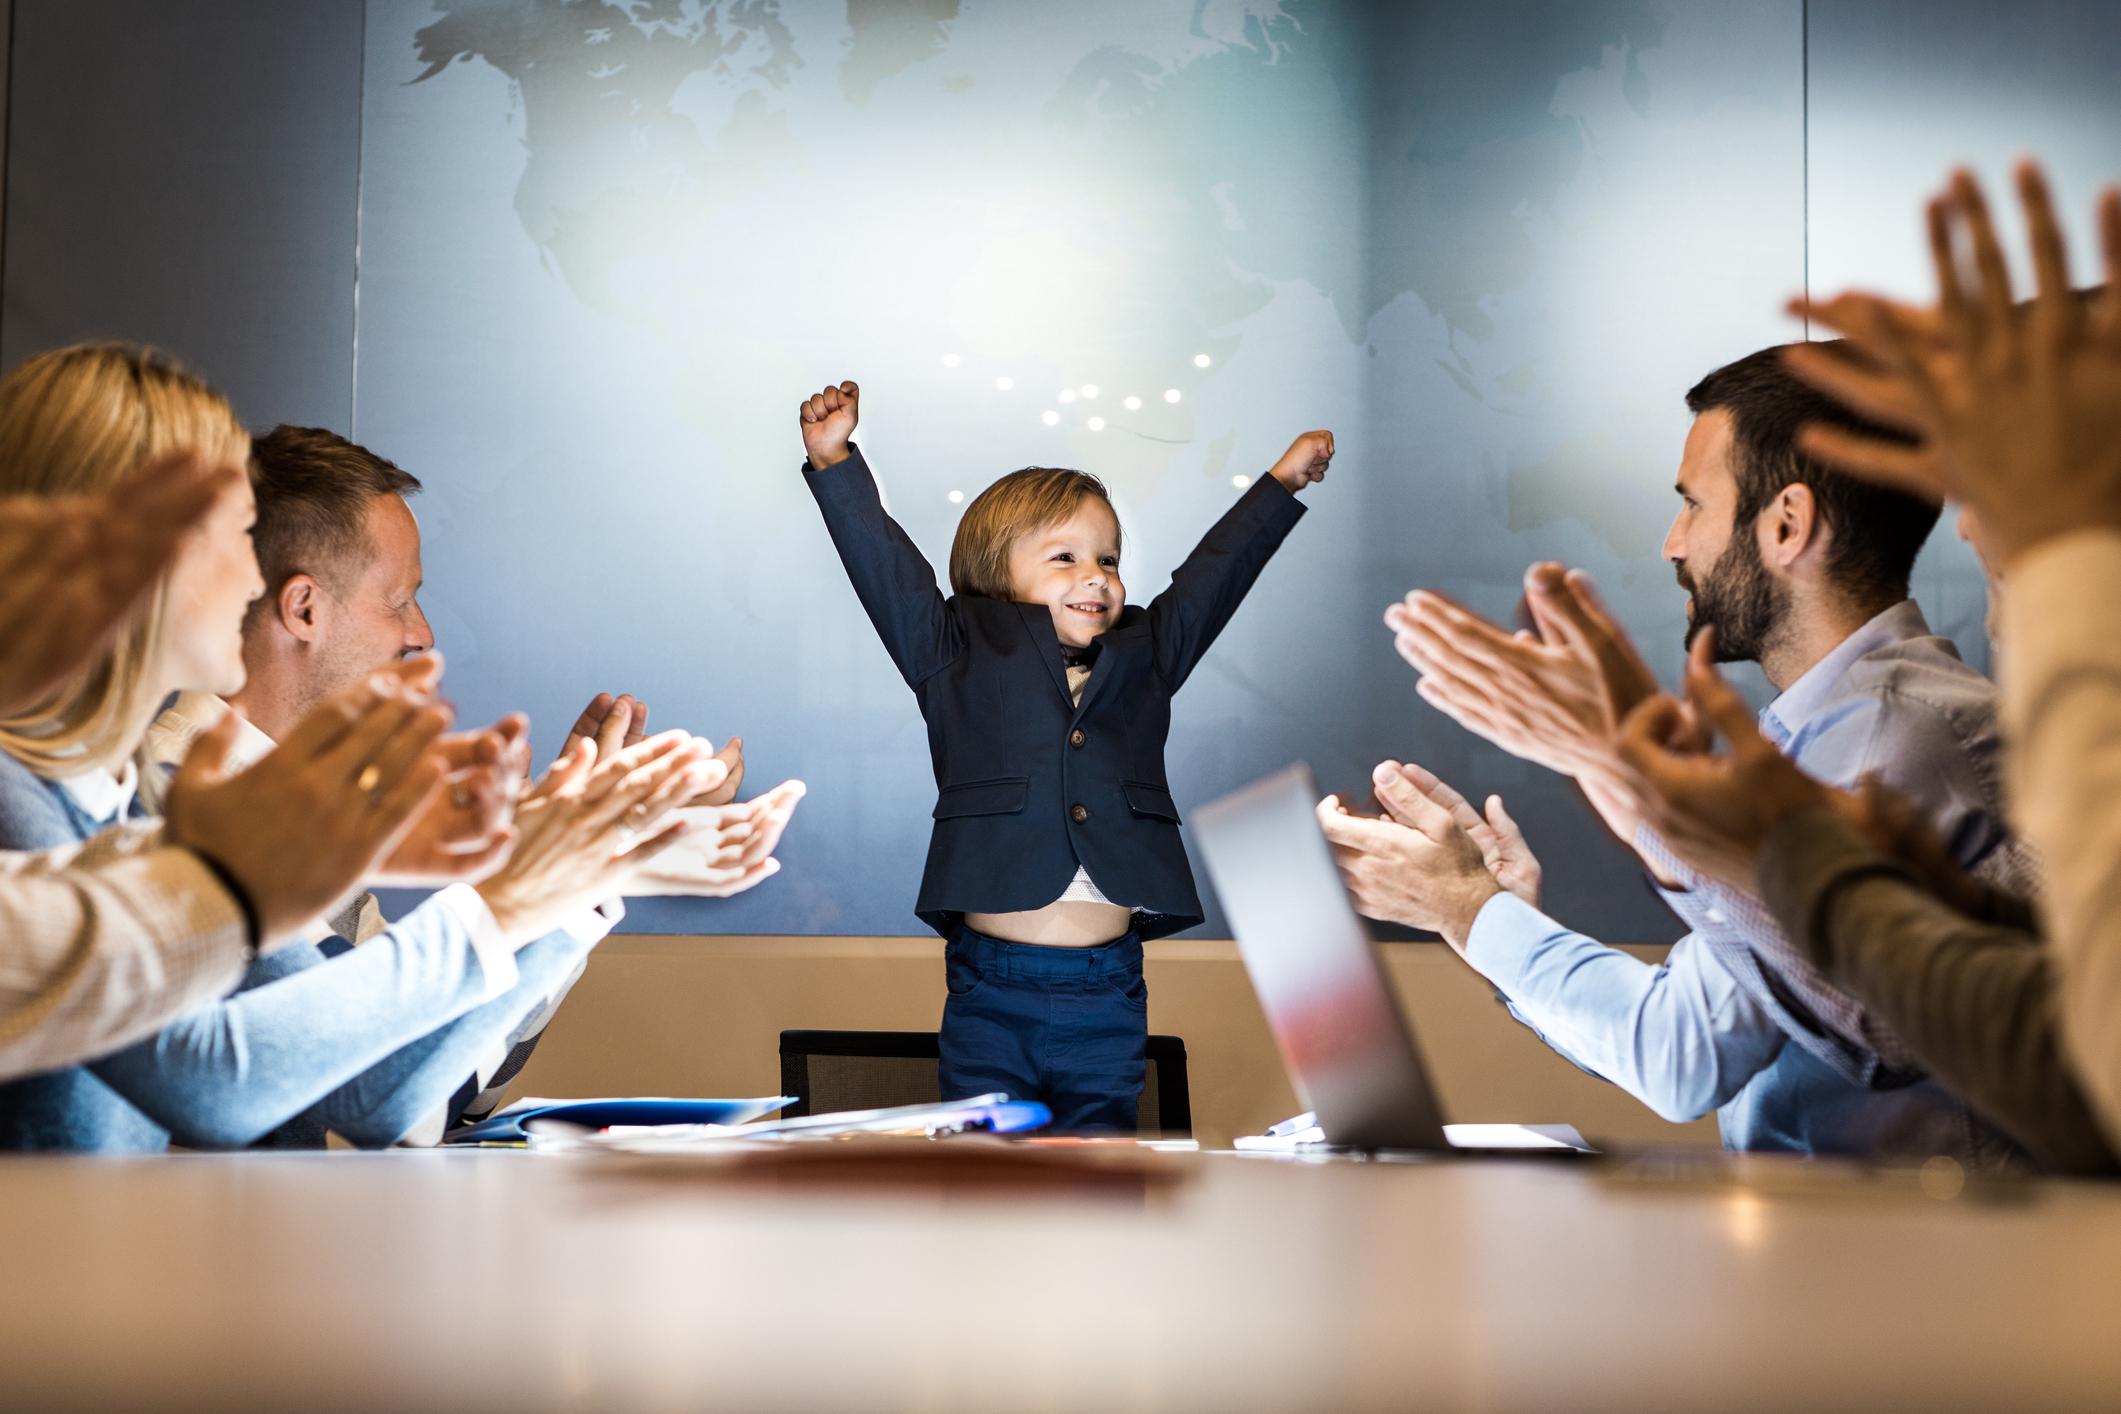 5 maneiras de ensinar empreendedorismo por meio de parceria escola-empresa